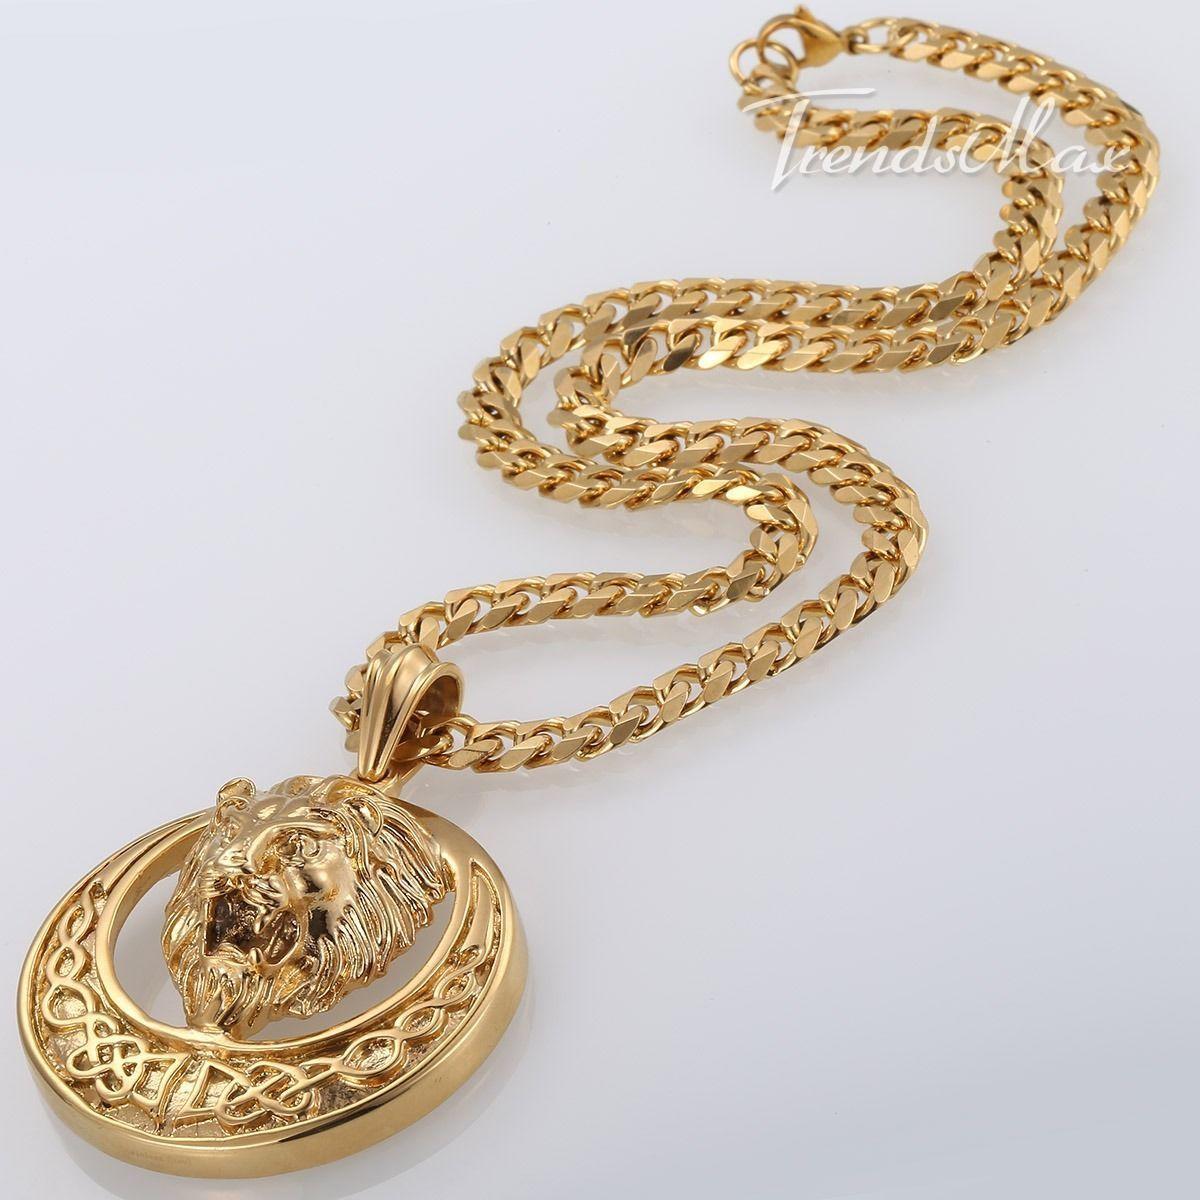 lion knot pendant gold plated mens chain cuban curb link. Black Bedroom Furniture Sets. Home Design Ideas